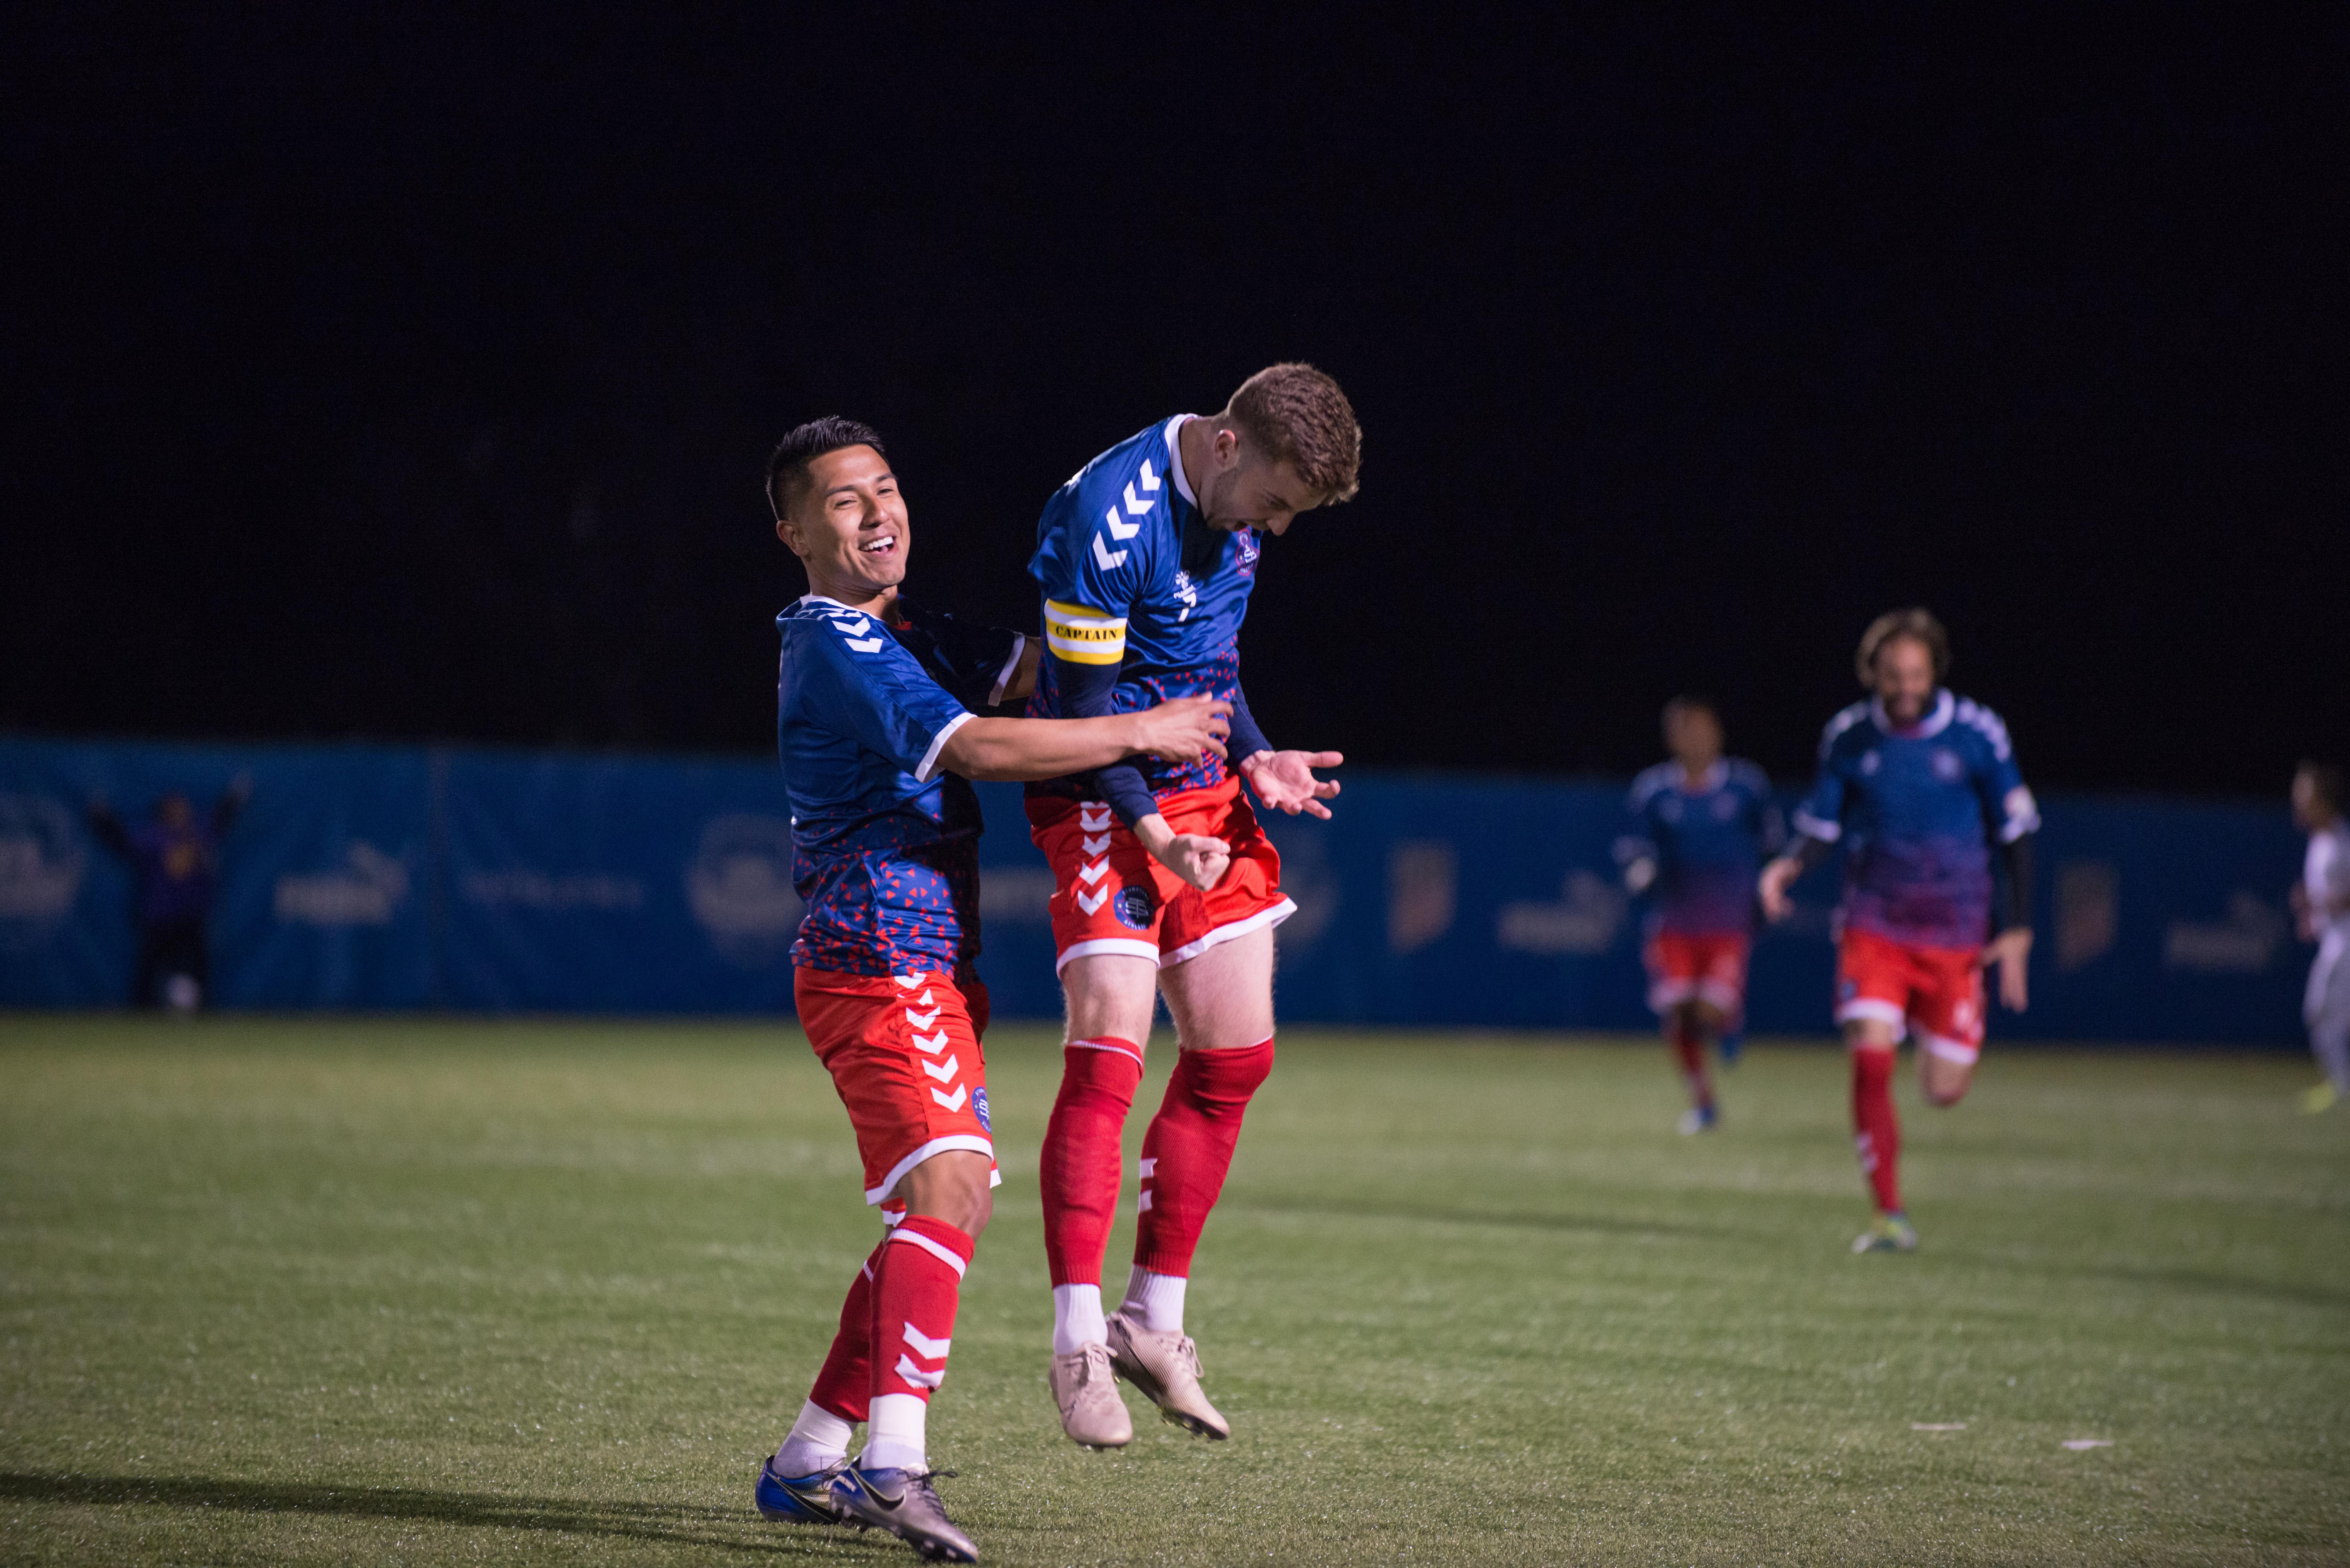 Tate Robertson (right) celebrates a goal with Randy Mendoza (left)